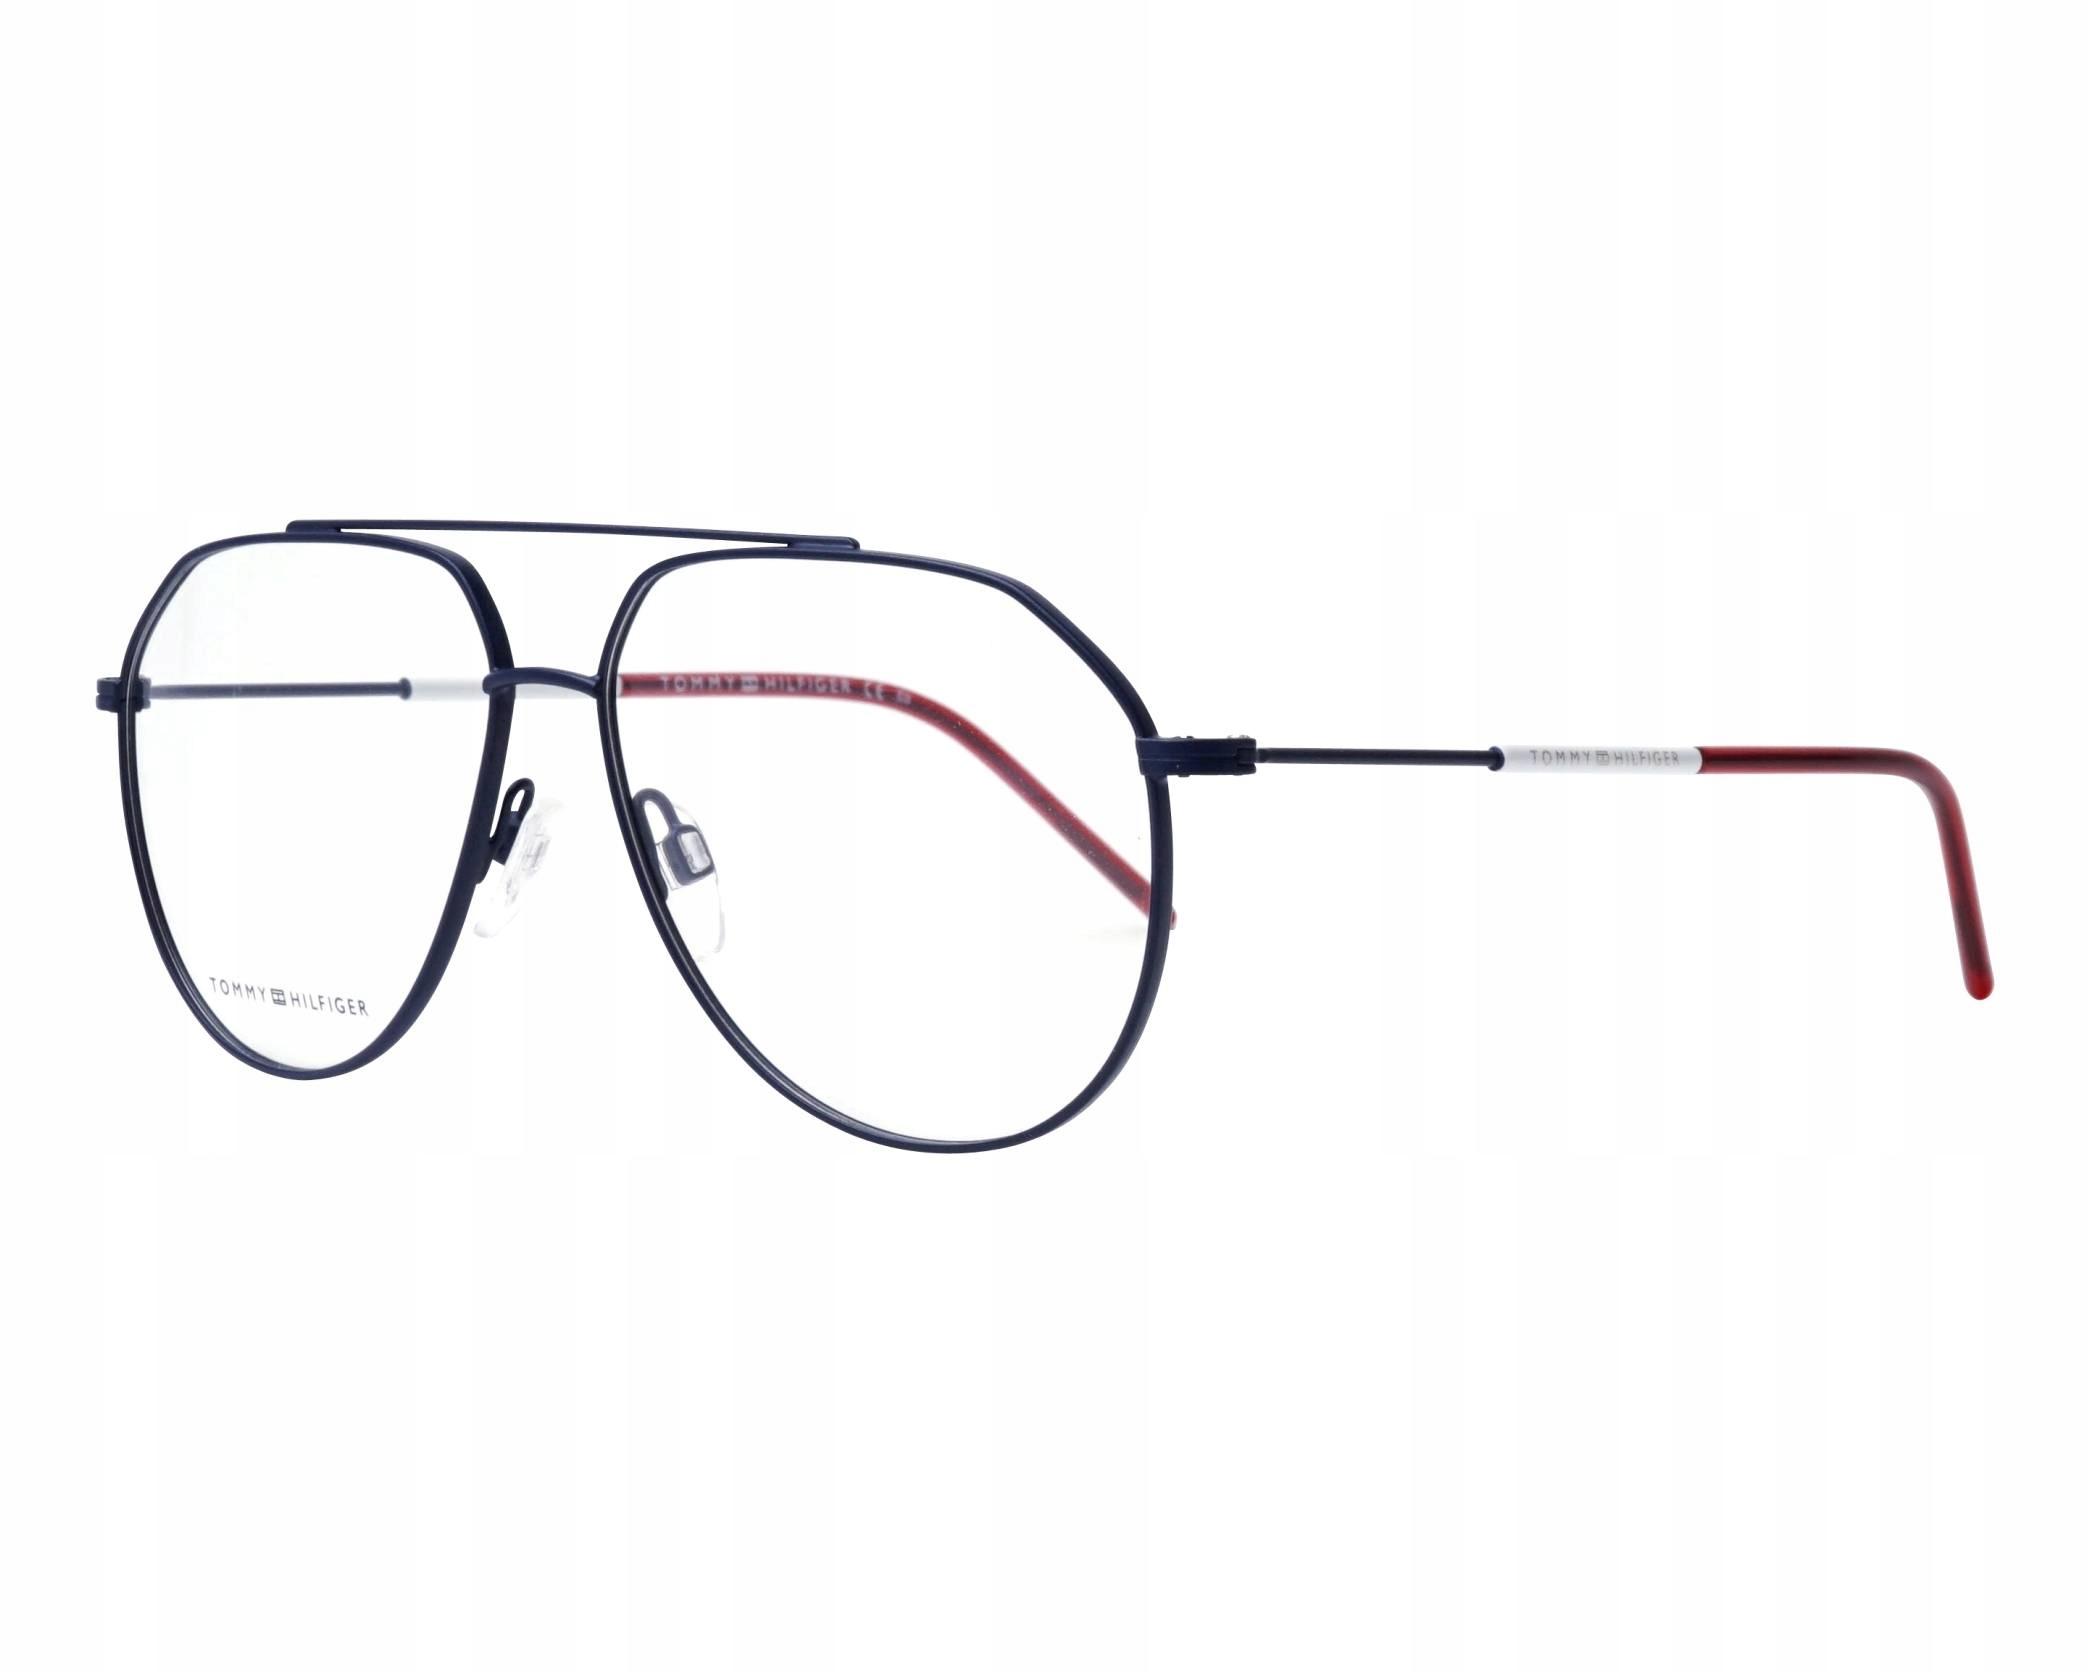 Tommy Hilfiger TH 1585 PJP oprawki okularowe